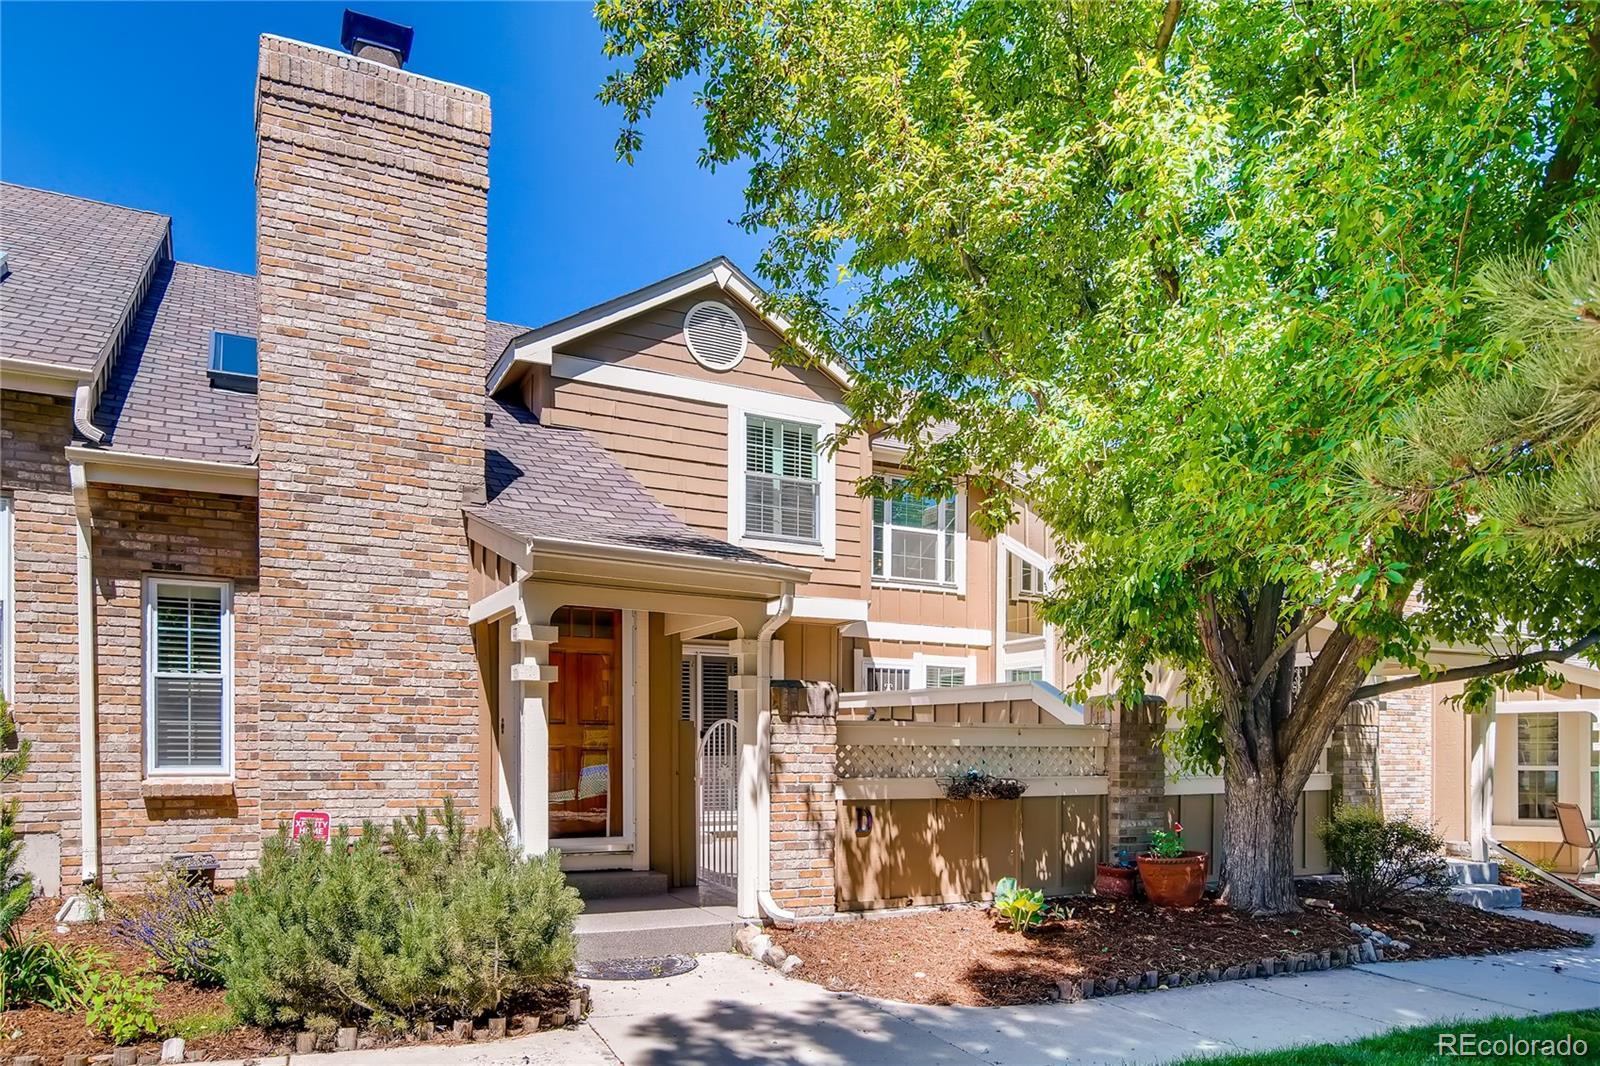 3011 W Long Court #D Property Photo - Littleton, CO real estate listing